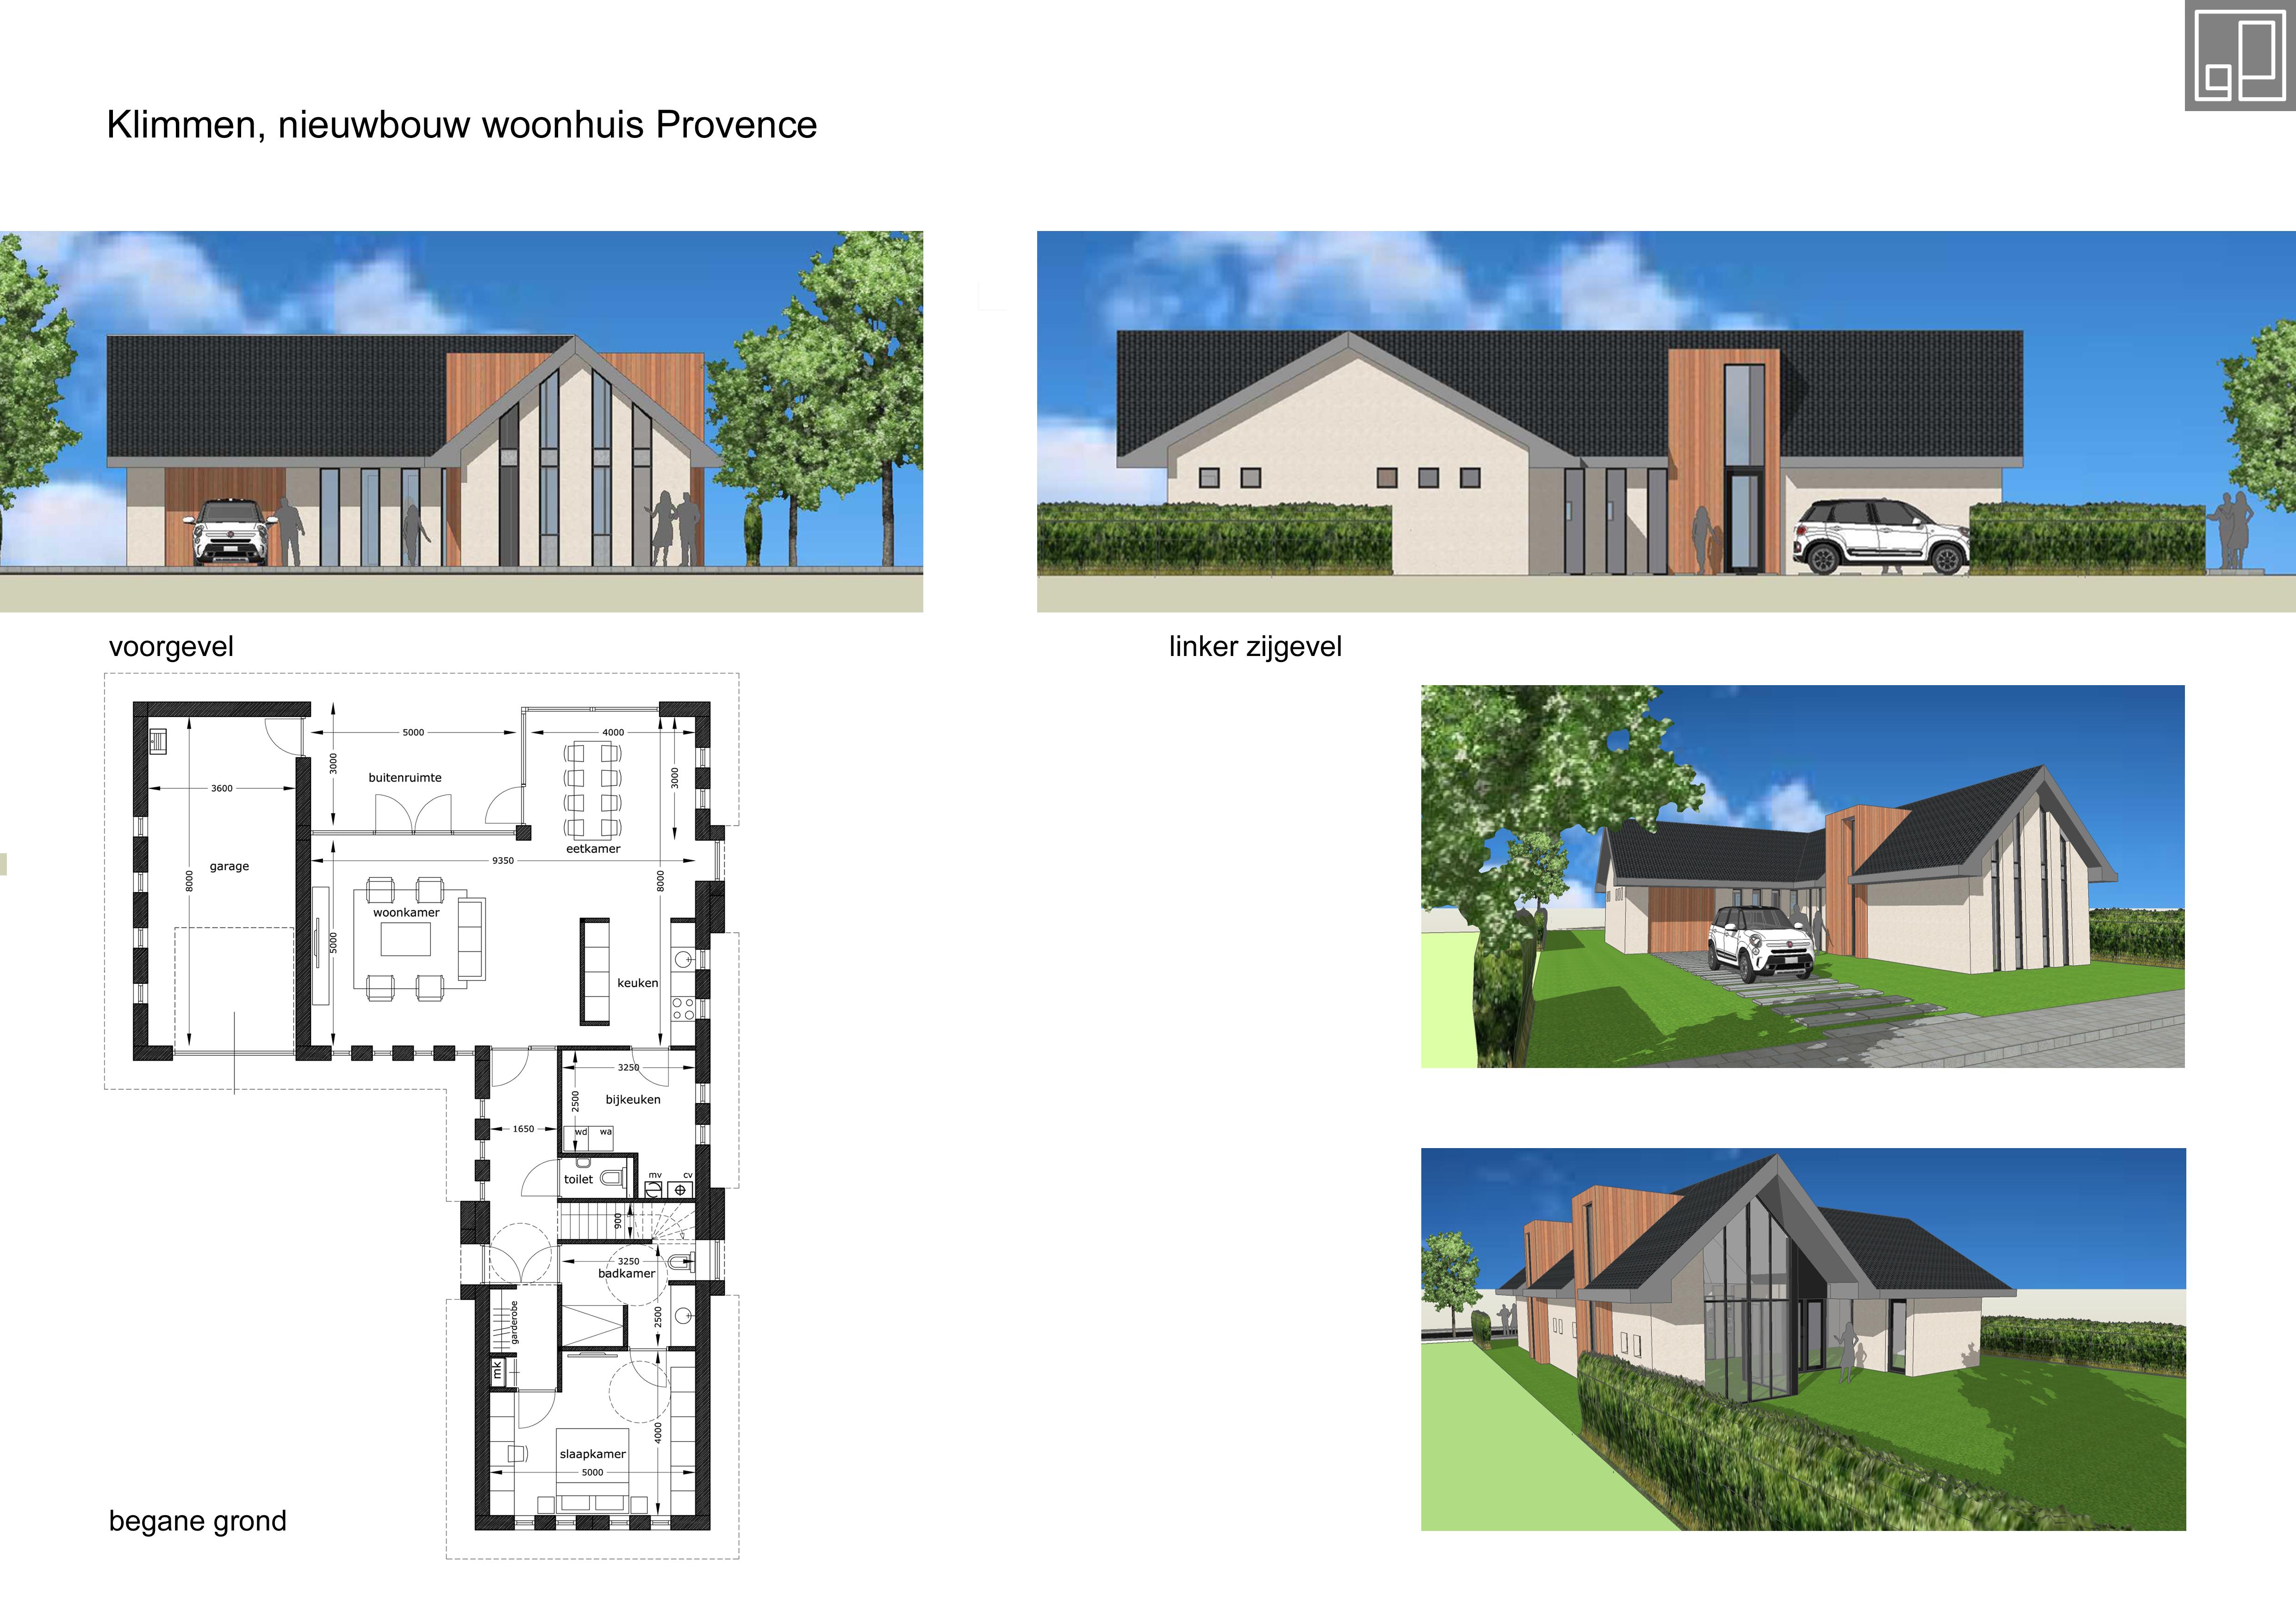 Nieuwbouw woonhuis Klimmen